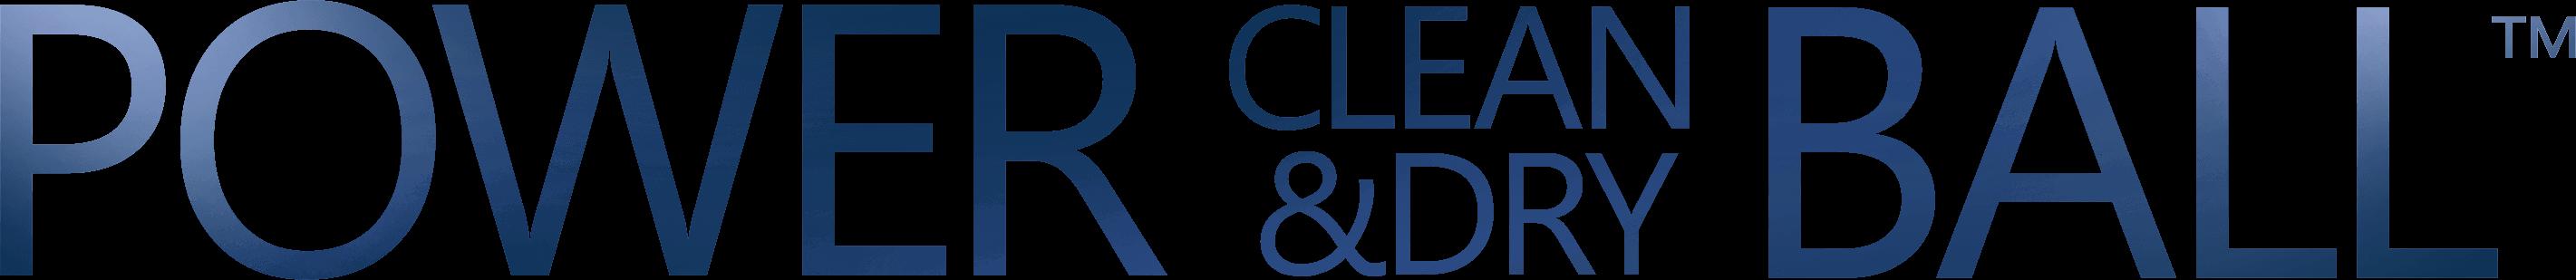 powercleanball-logo